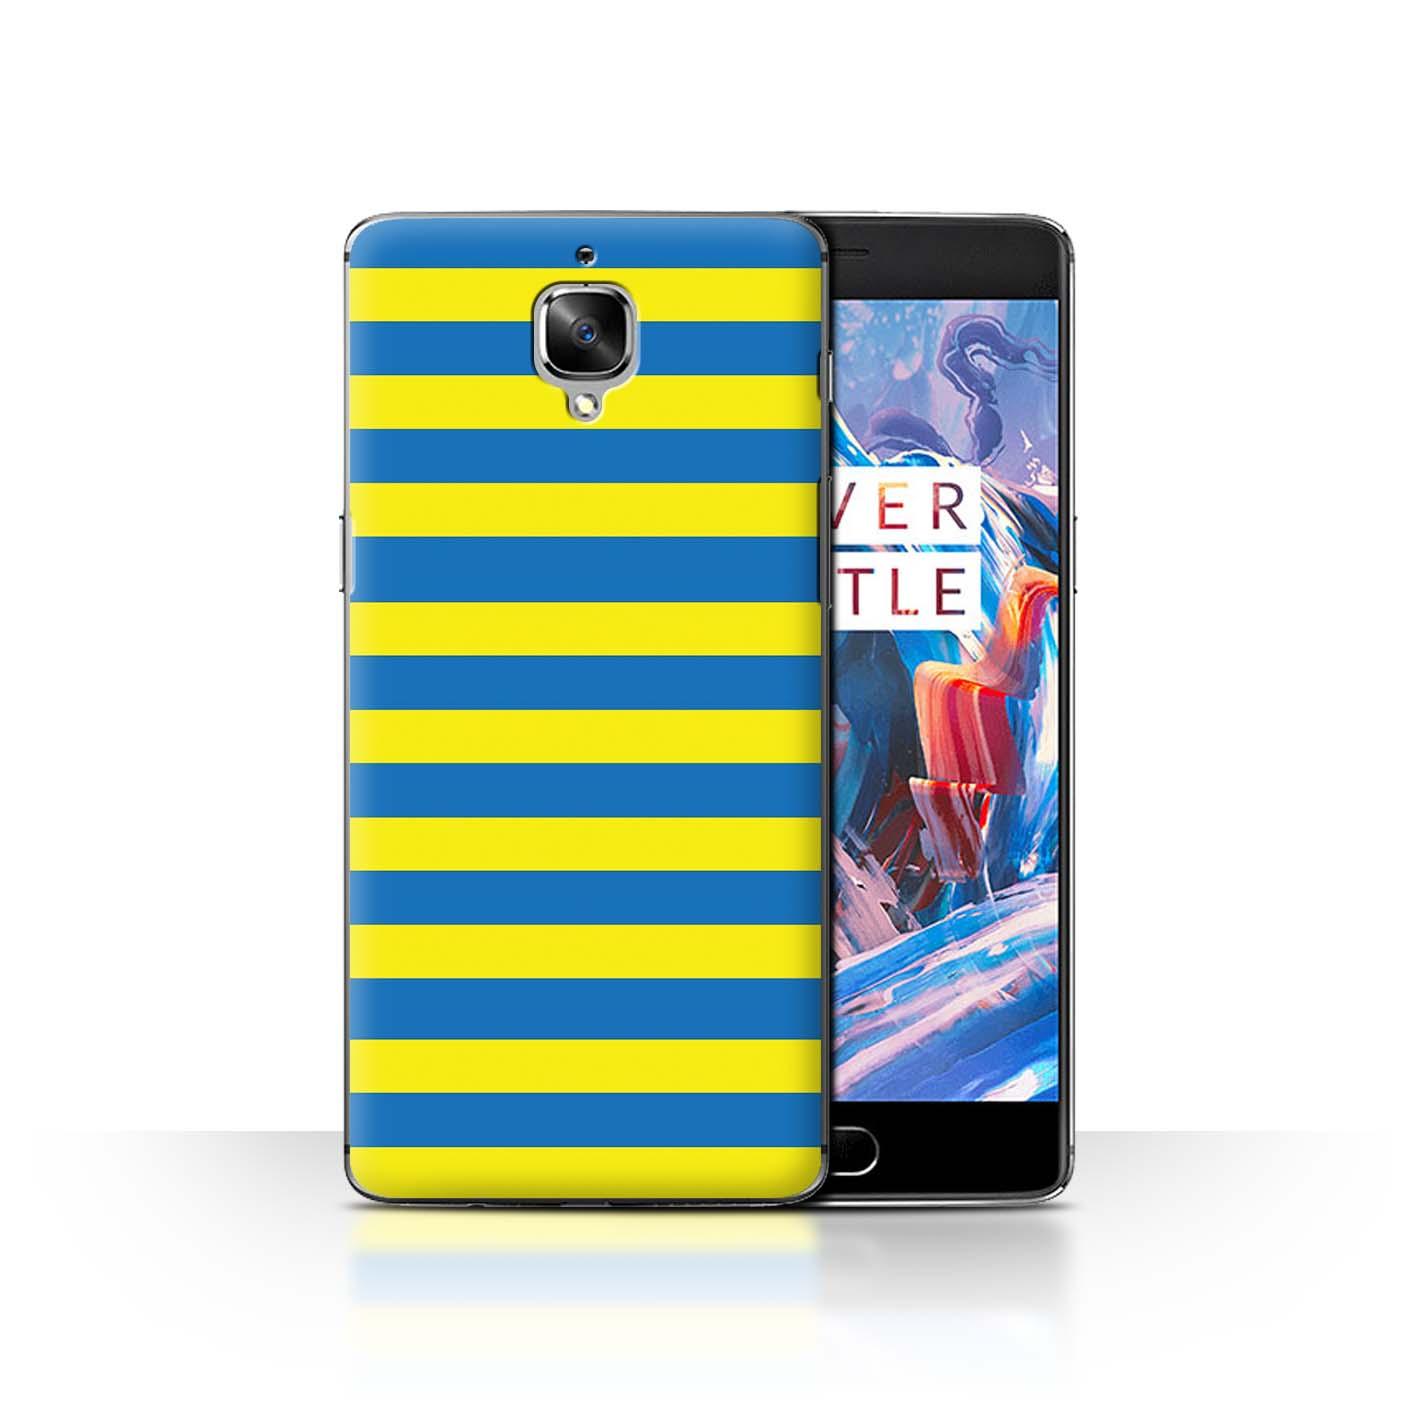 Coque-Etui-Housse-de-Stuff4-pour-OnePlus-3-3T-Mode-Jaune